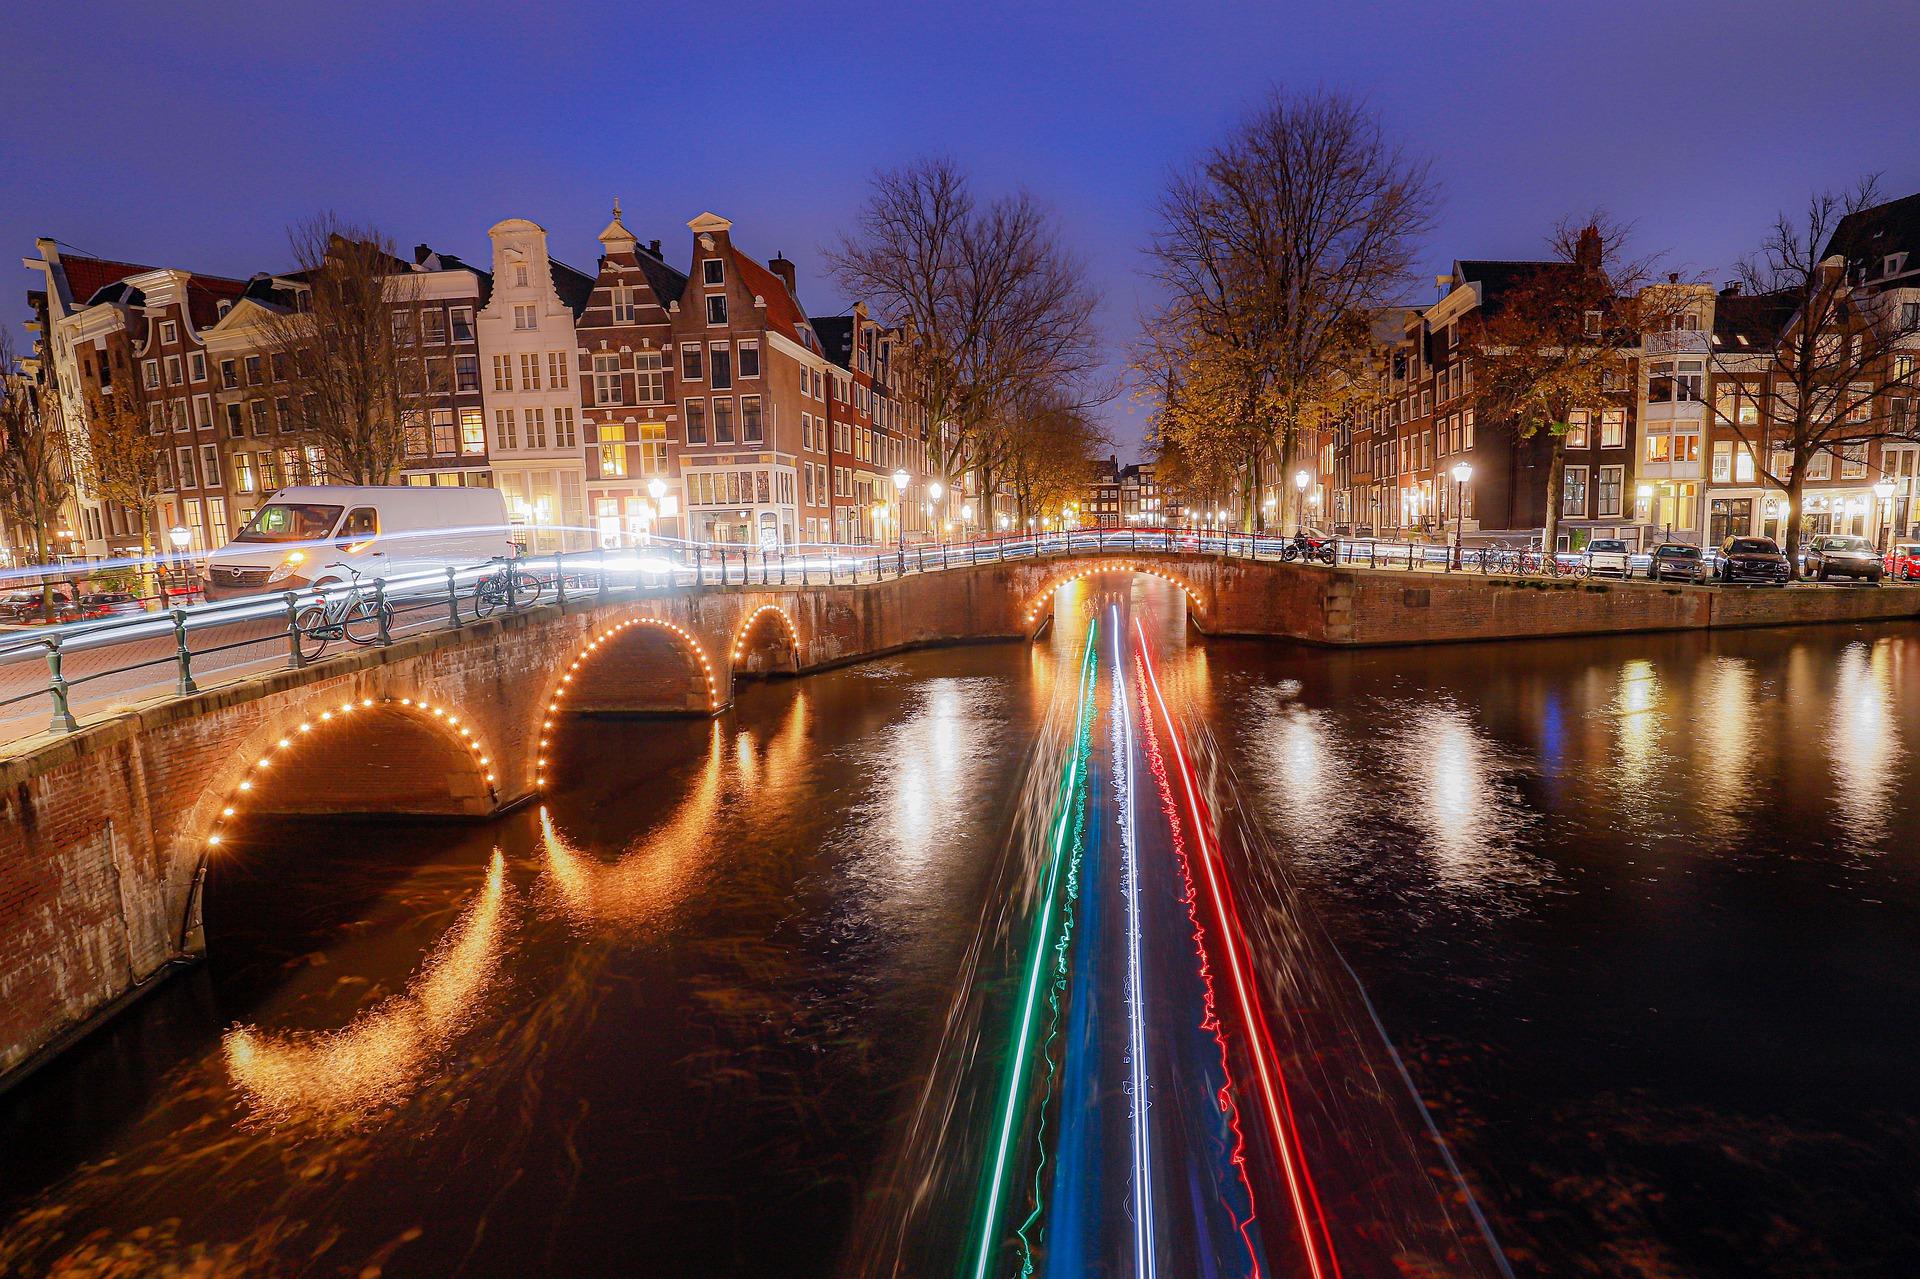 Peisaj nocturn din Amsterdam - un pod în stil tradițional, iluminat